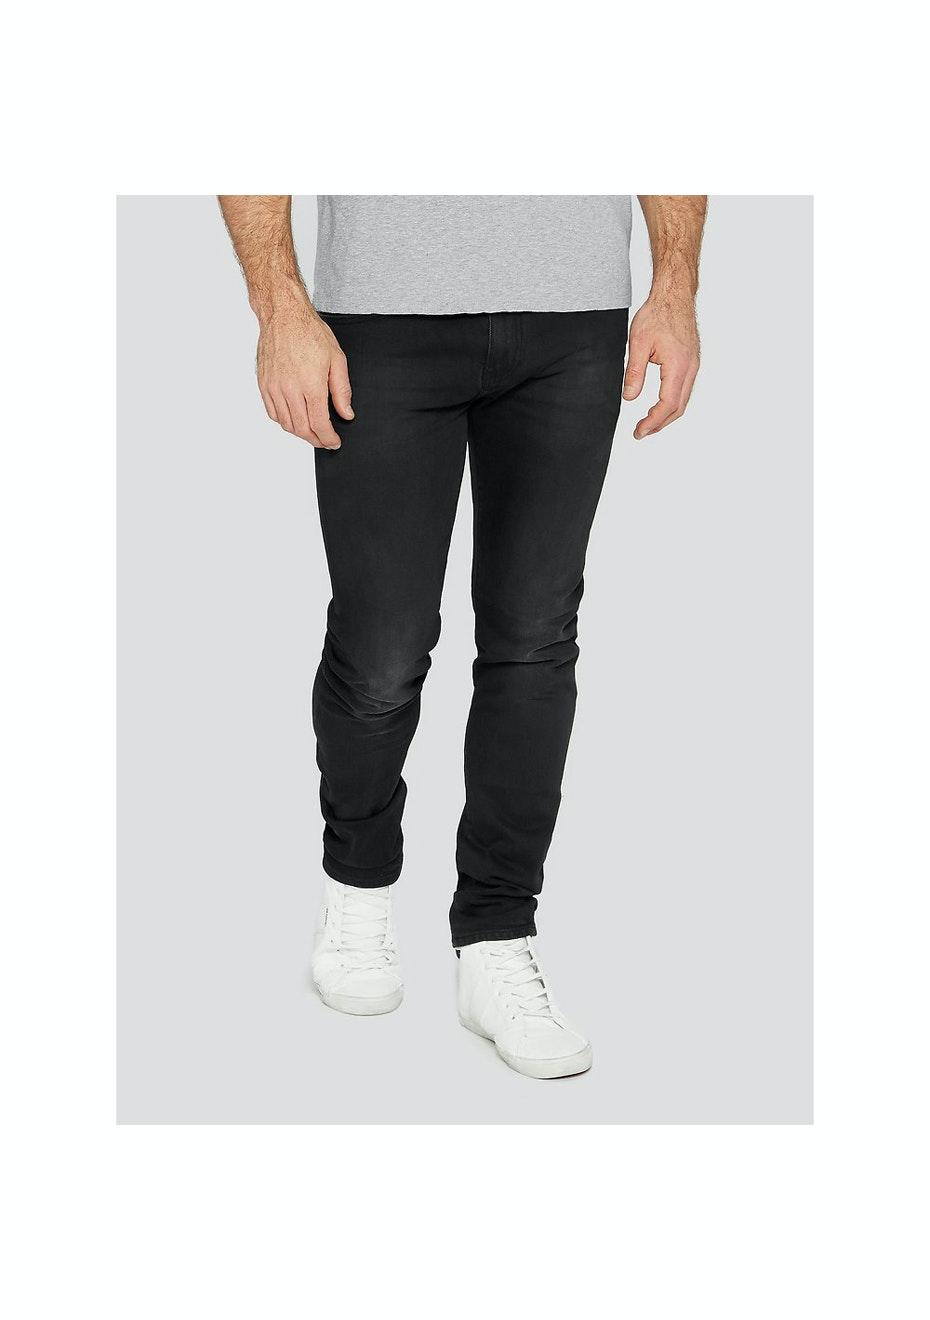 Ben Sherman - Dingley Jean  - Vintage Black